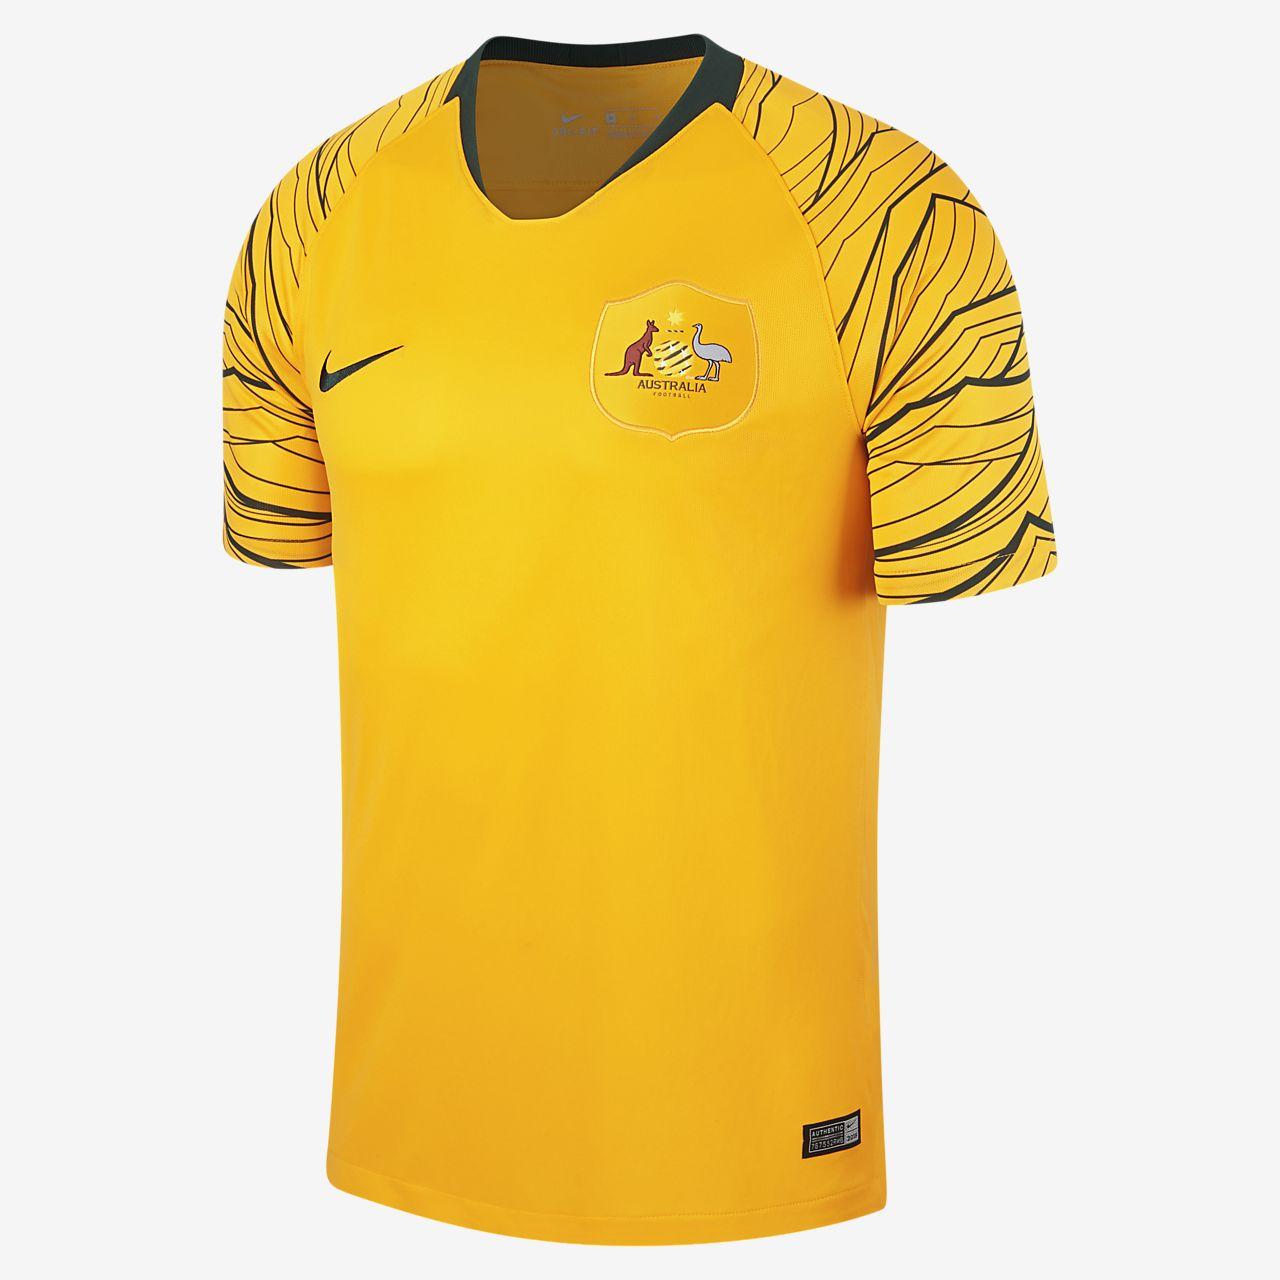 nfl jerseys australia